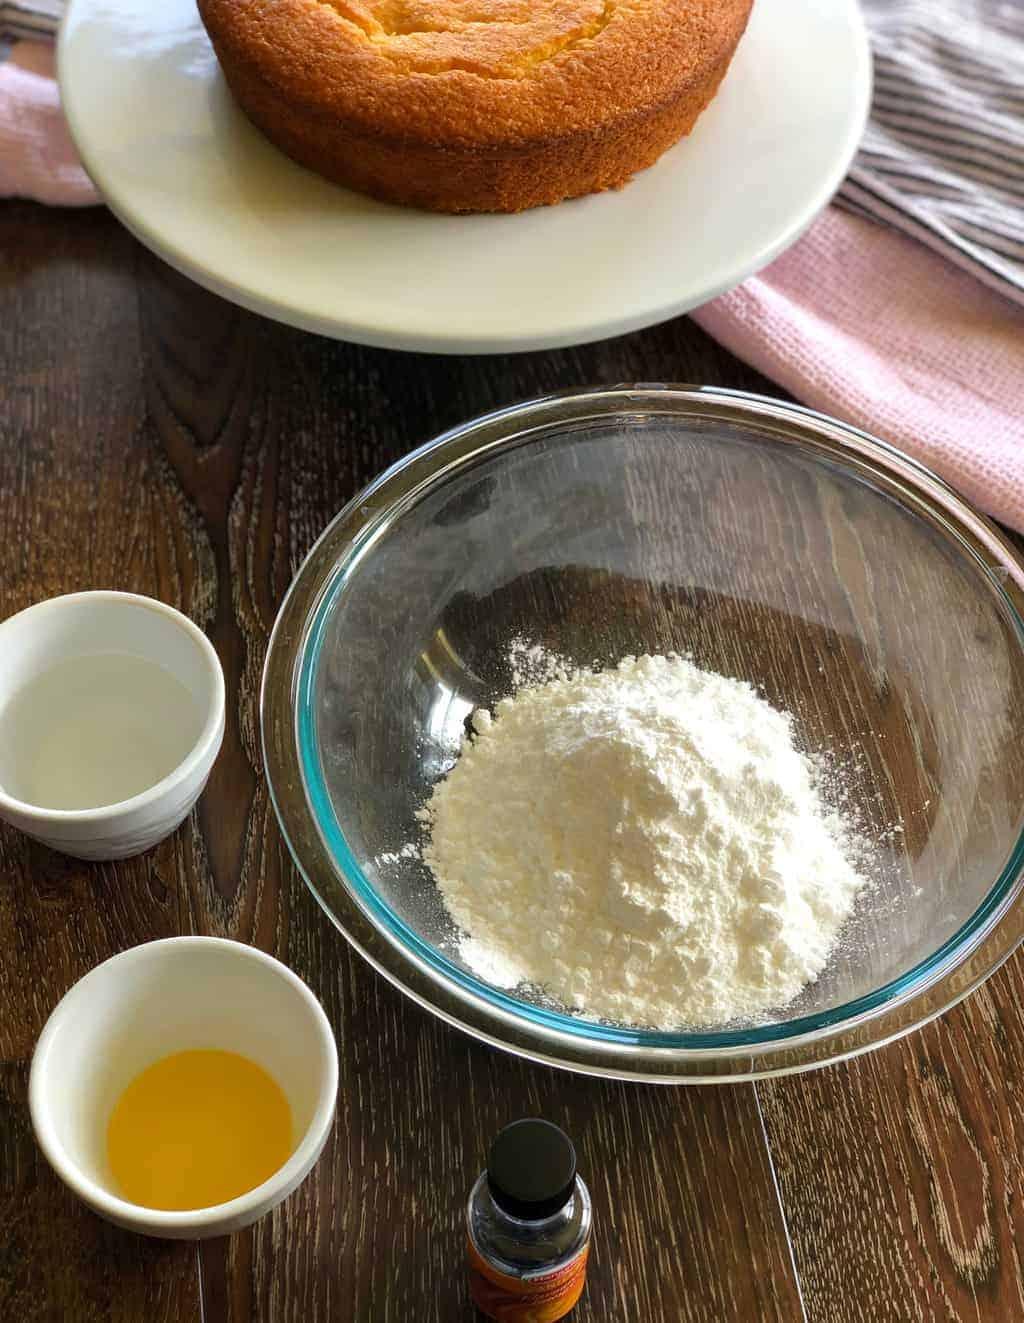 Basic Vanilla Icing